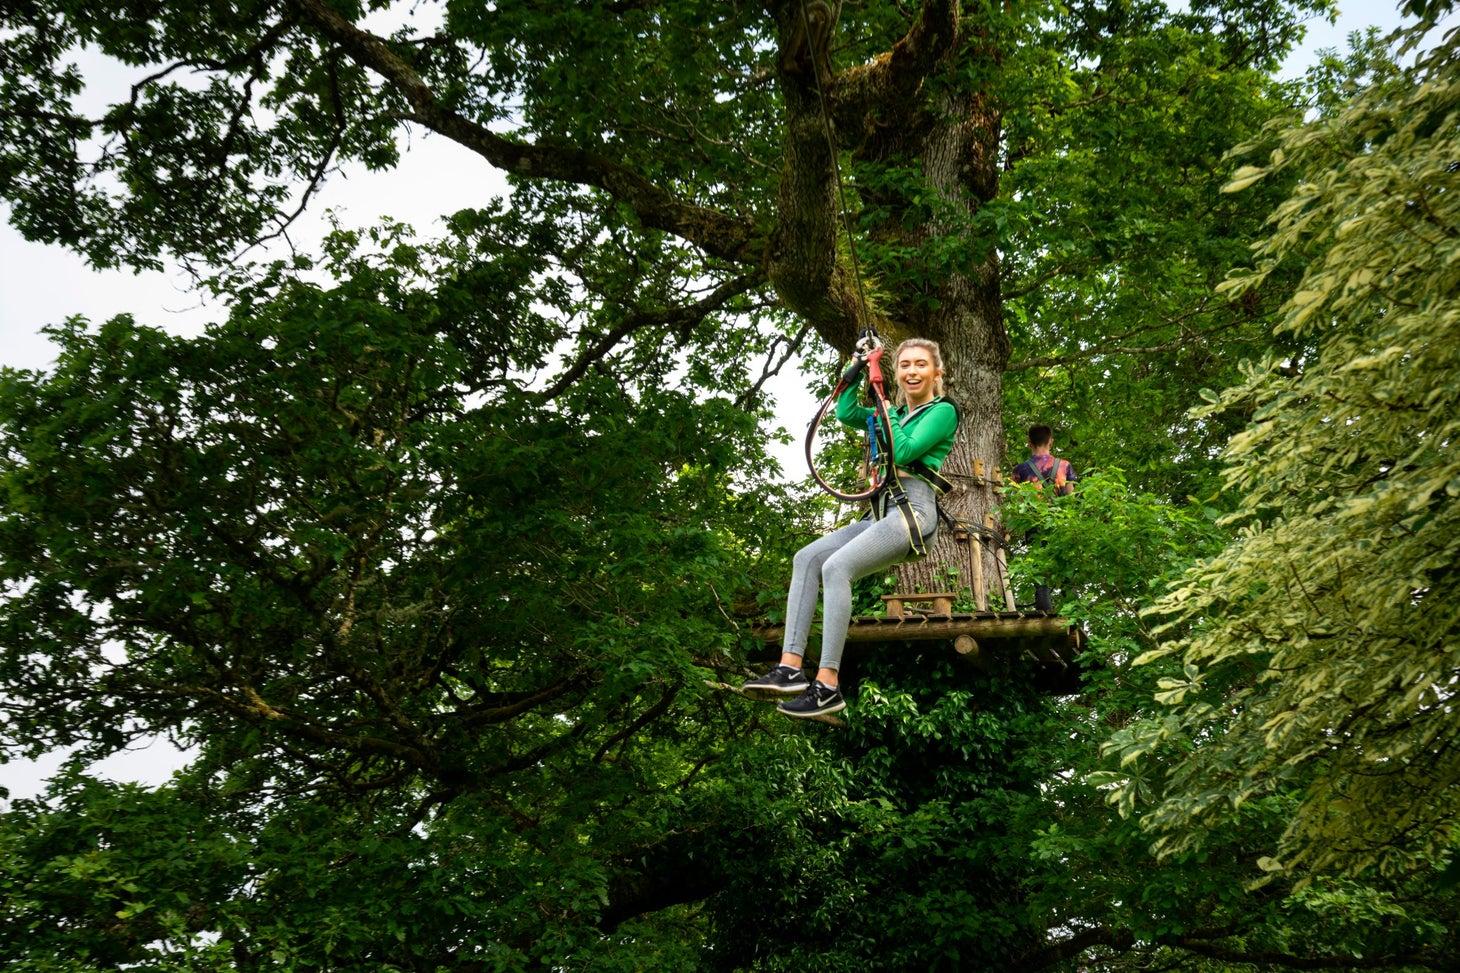 Ziplining at Lough Key Forest Park